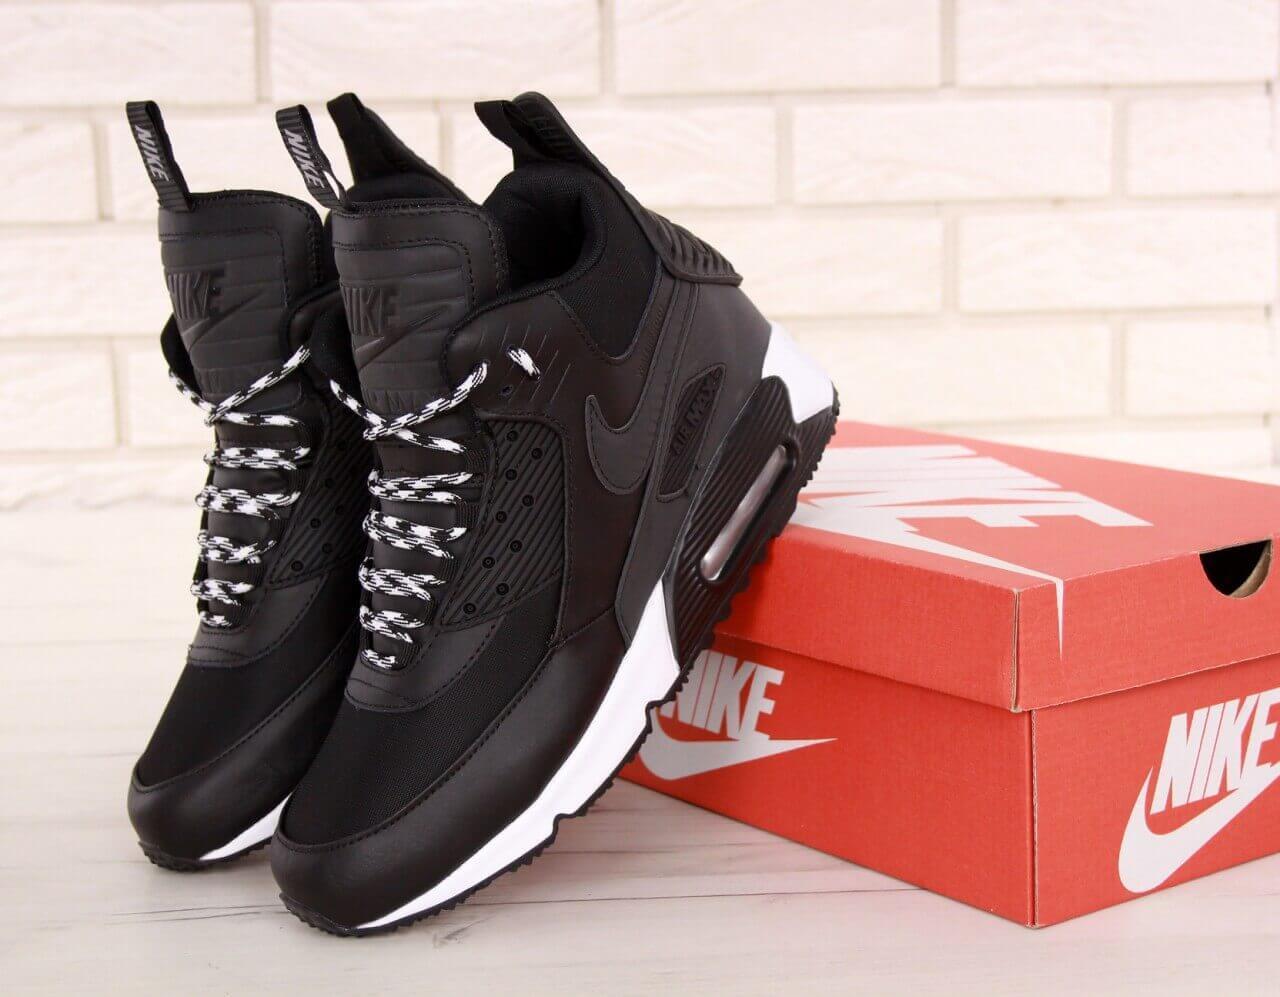 Зимние мужские кроссовки Nike Air Max 90 Sneakerboot Winter Black ... 55e77196e56